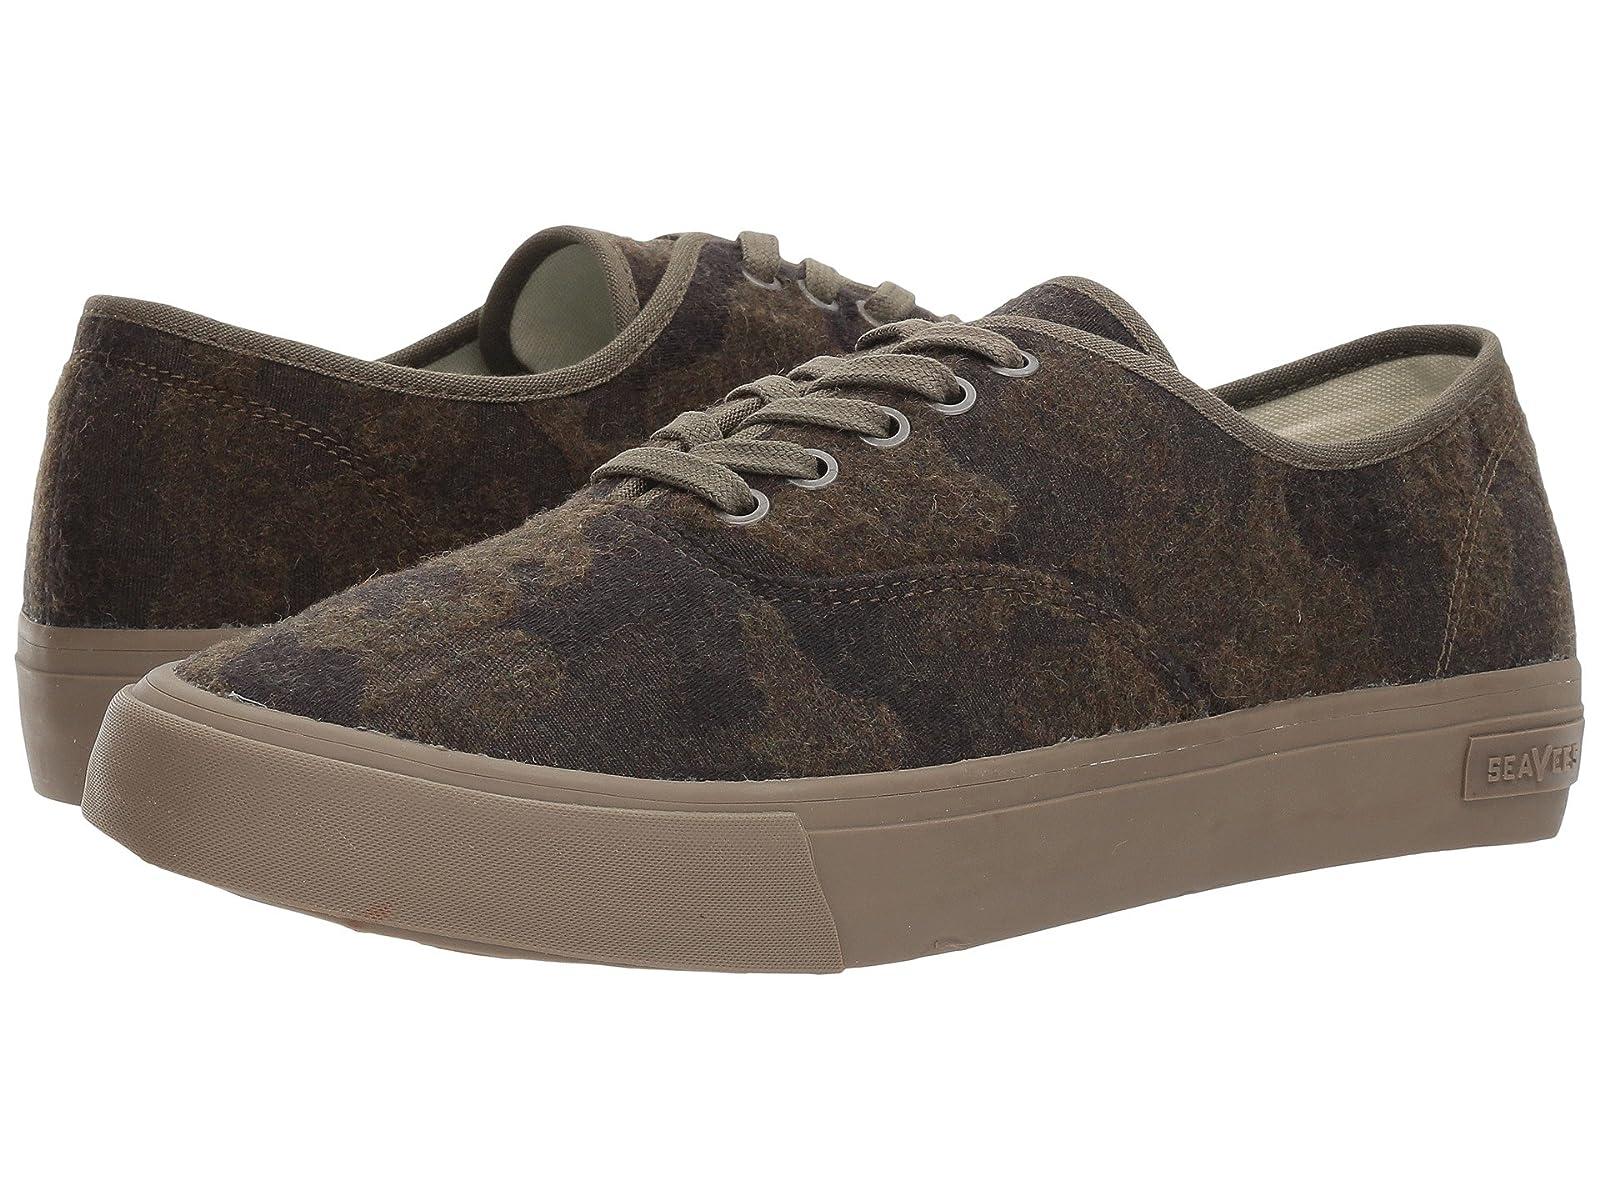 SeaVees Legend Sneaker WintertideCheap and distinctive eye-catching shoes